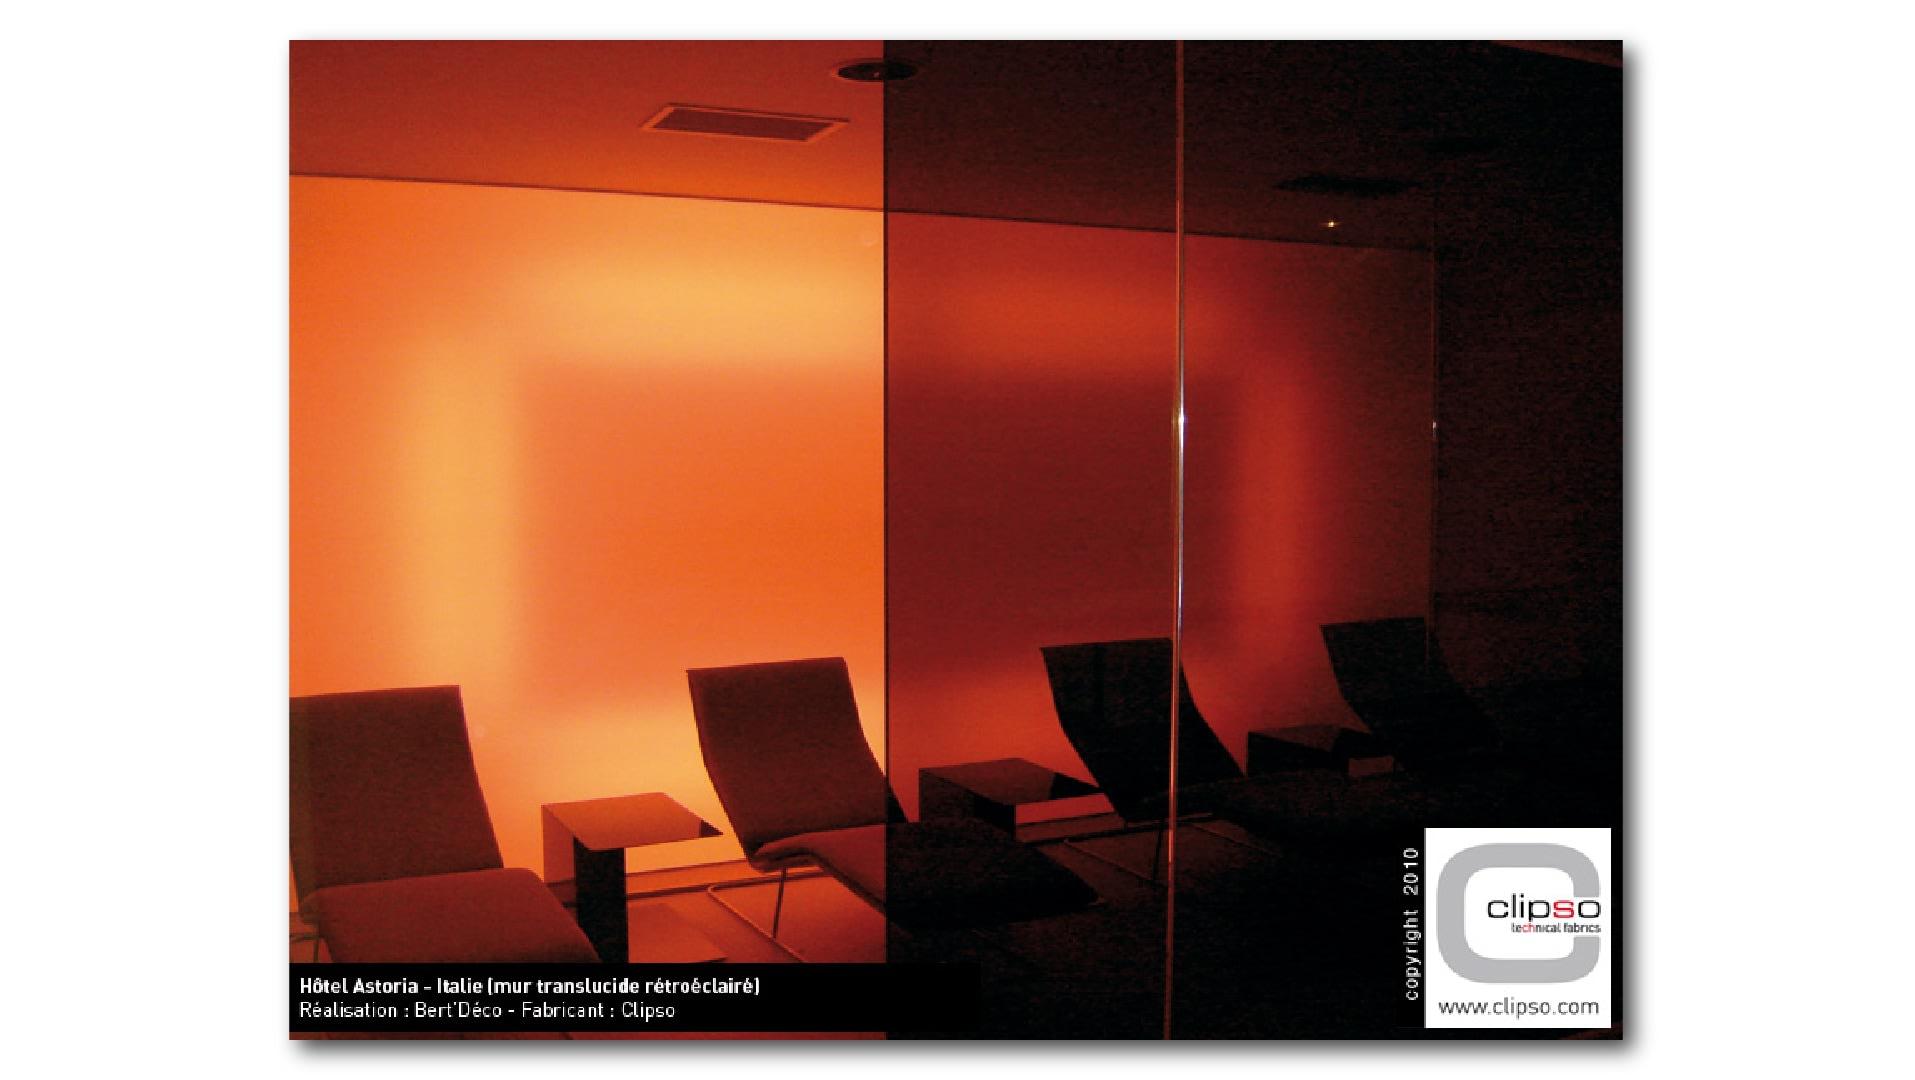 lounge-1-relanxen-lichtdusche-wellness-clipso-transluzent2-01_aipapi